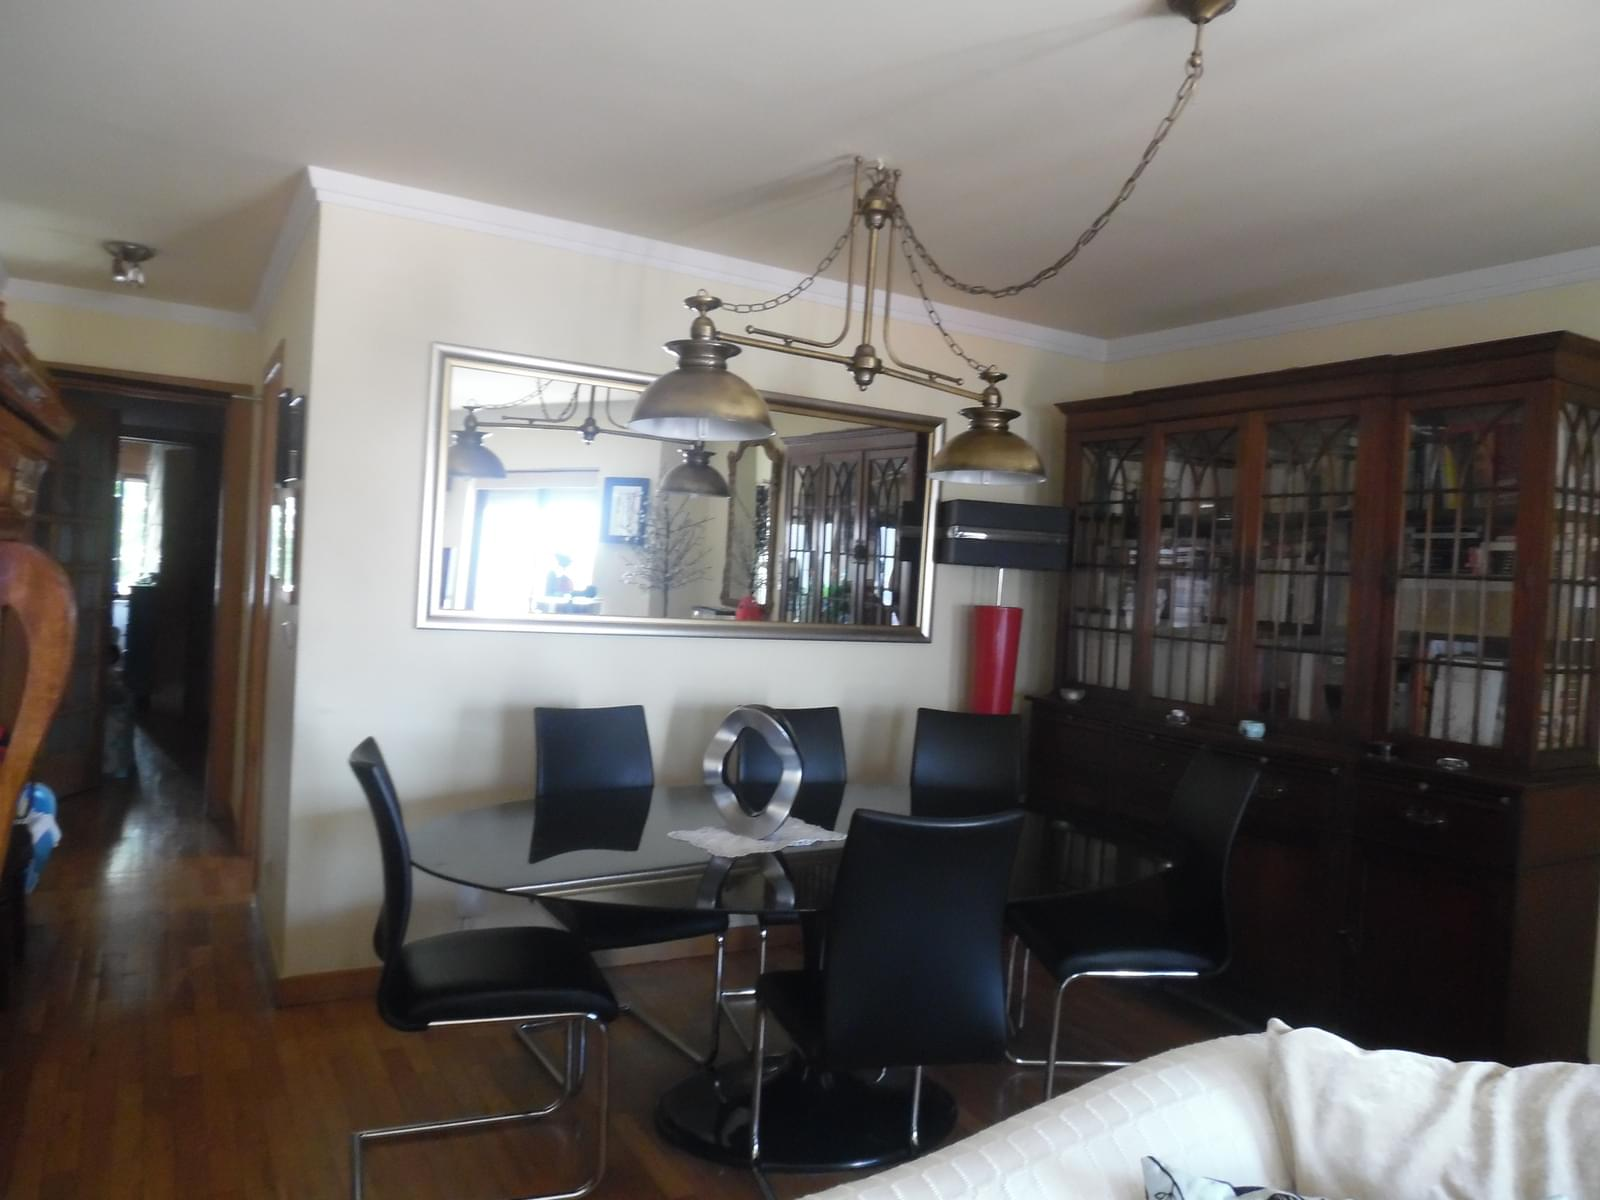 pf17977-apartamento-t2-lisboa-7decd954-74f5-4593-ace9-b16afea0002c